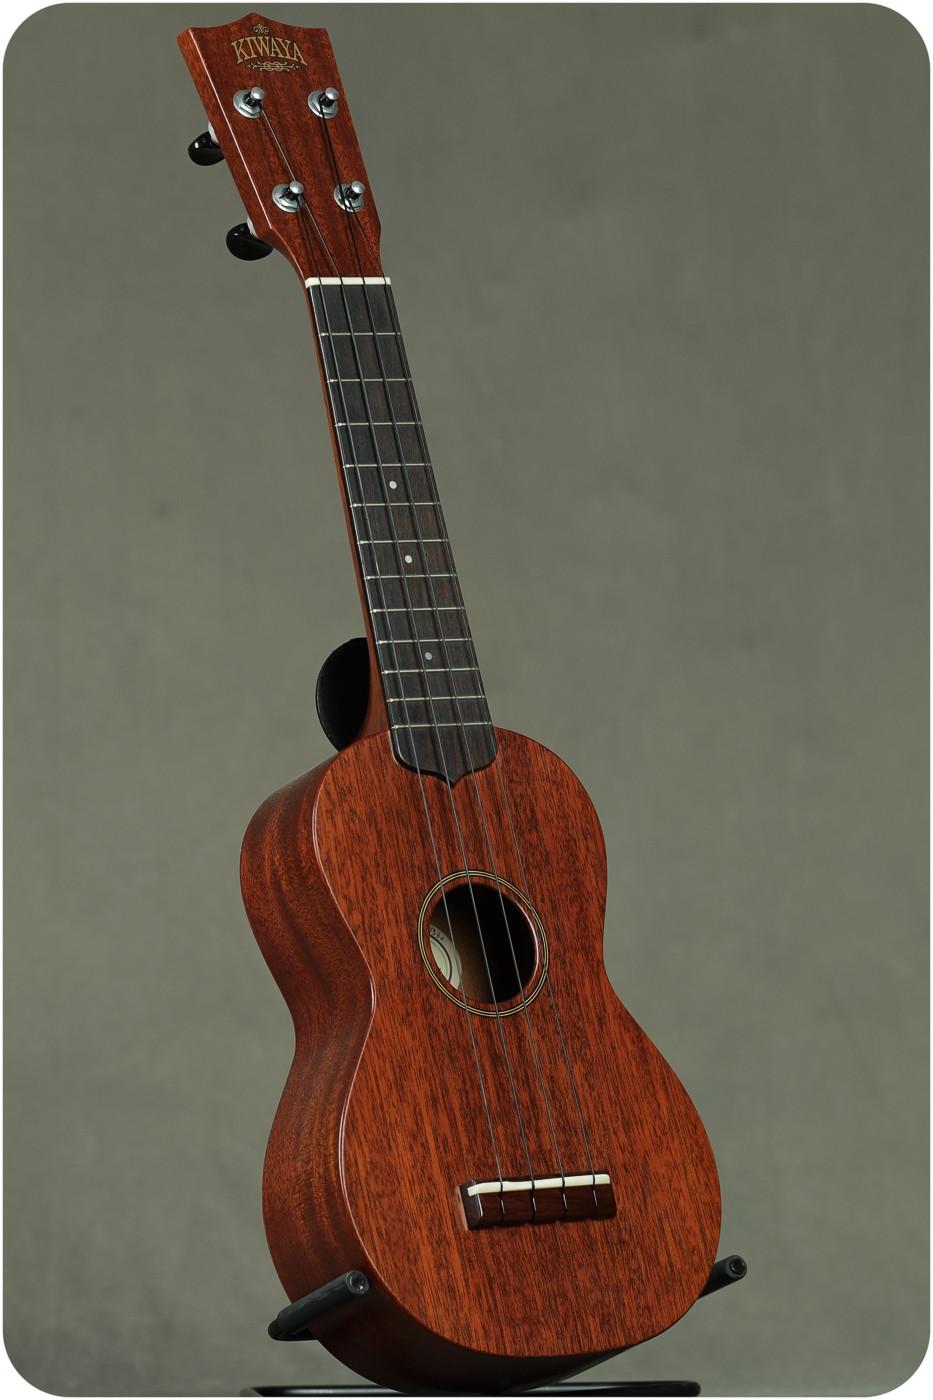 Kiwaya Solid Mahogany Soprano (KTS-4 1685)